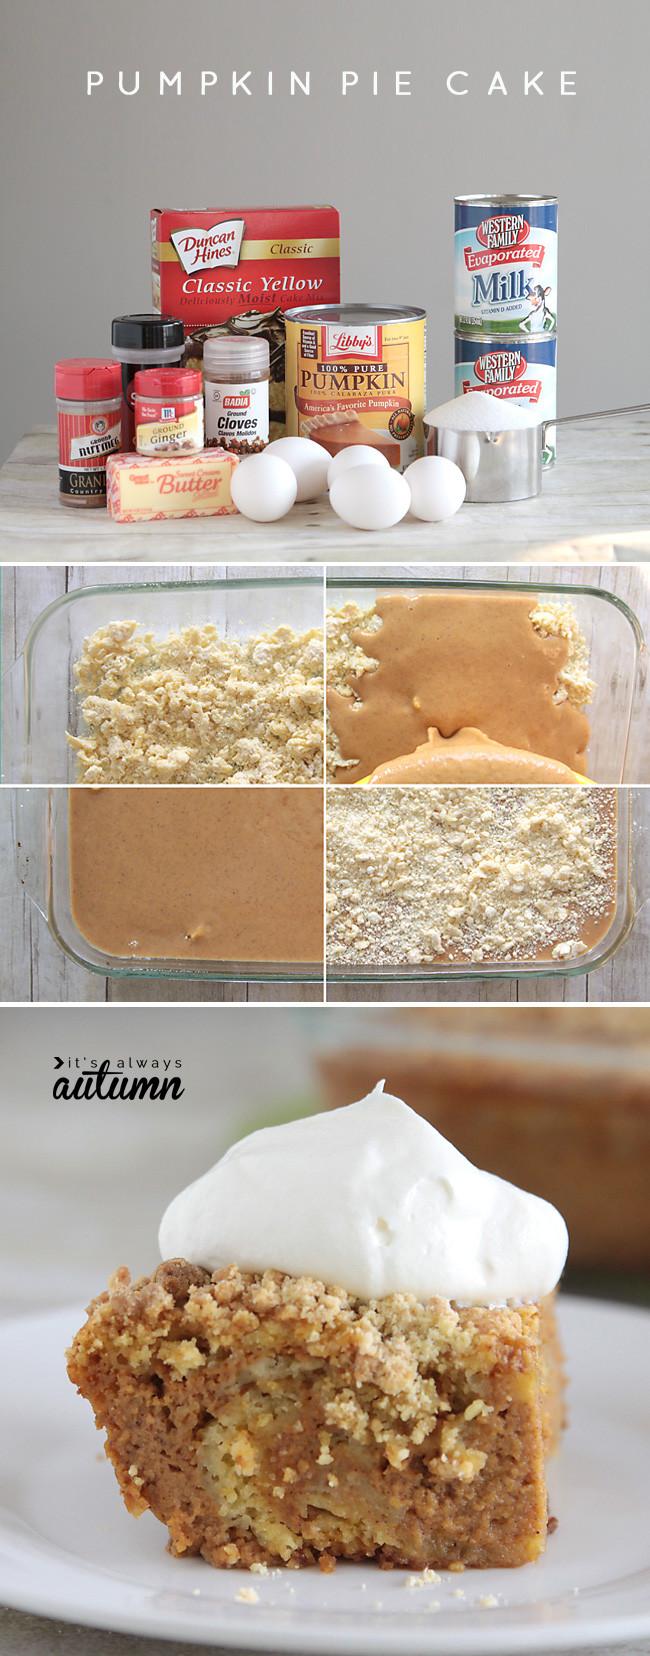 Pumpkin Pie Cake Recipe  easy pumpkin pie cake recipe better than pumpkin pie